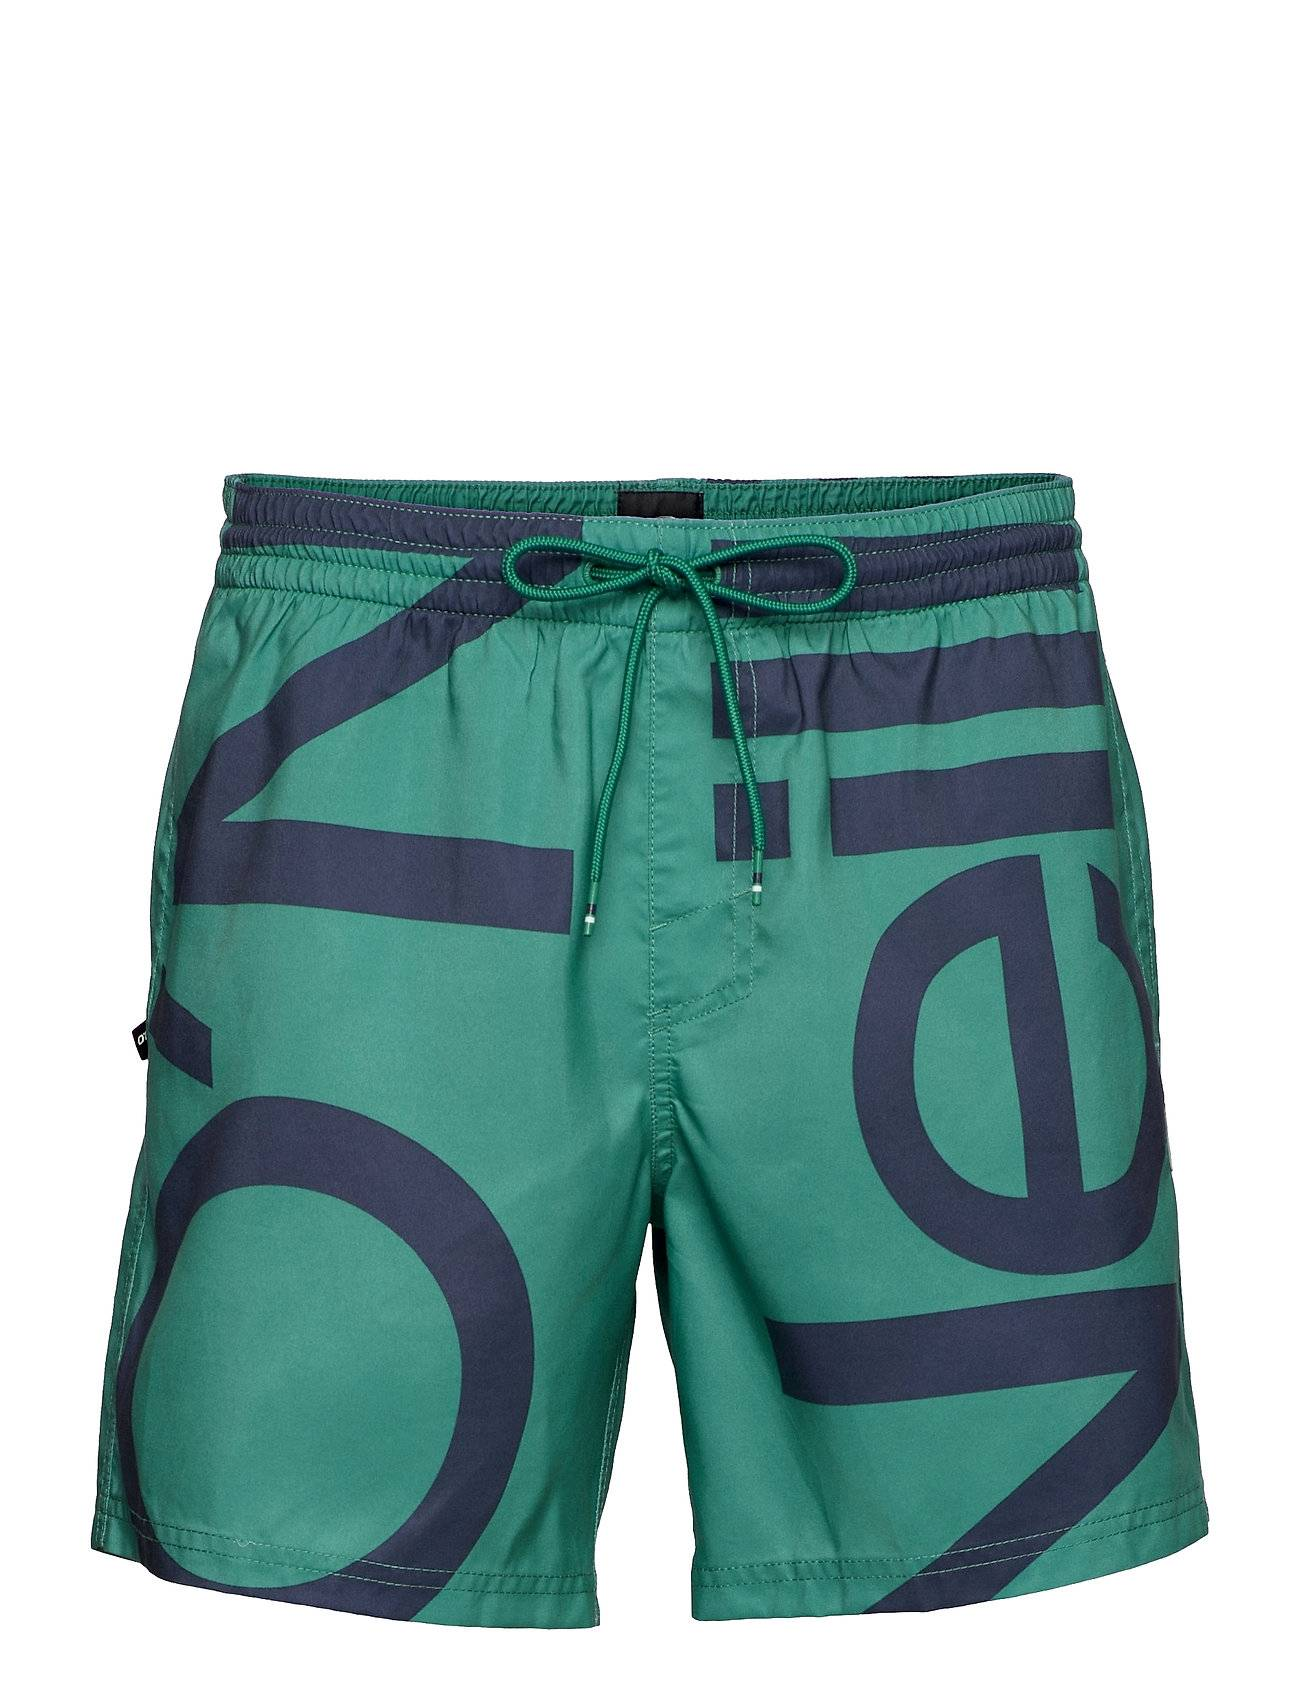 O'neill Pm Cali Zoom Shorts Surfeshorts Grønn O'neill